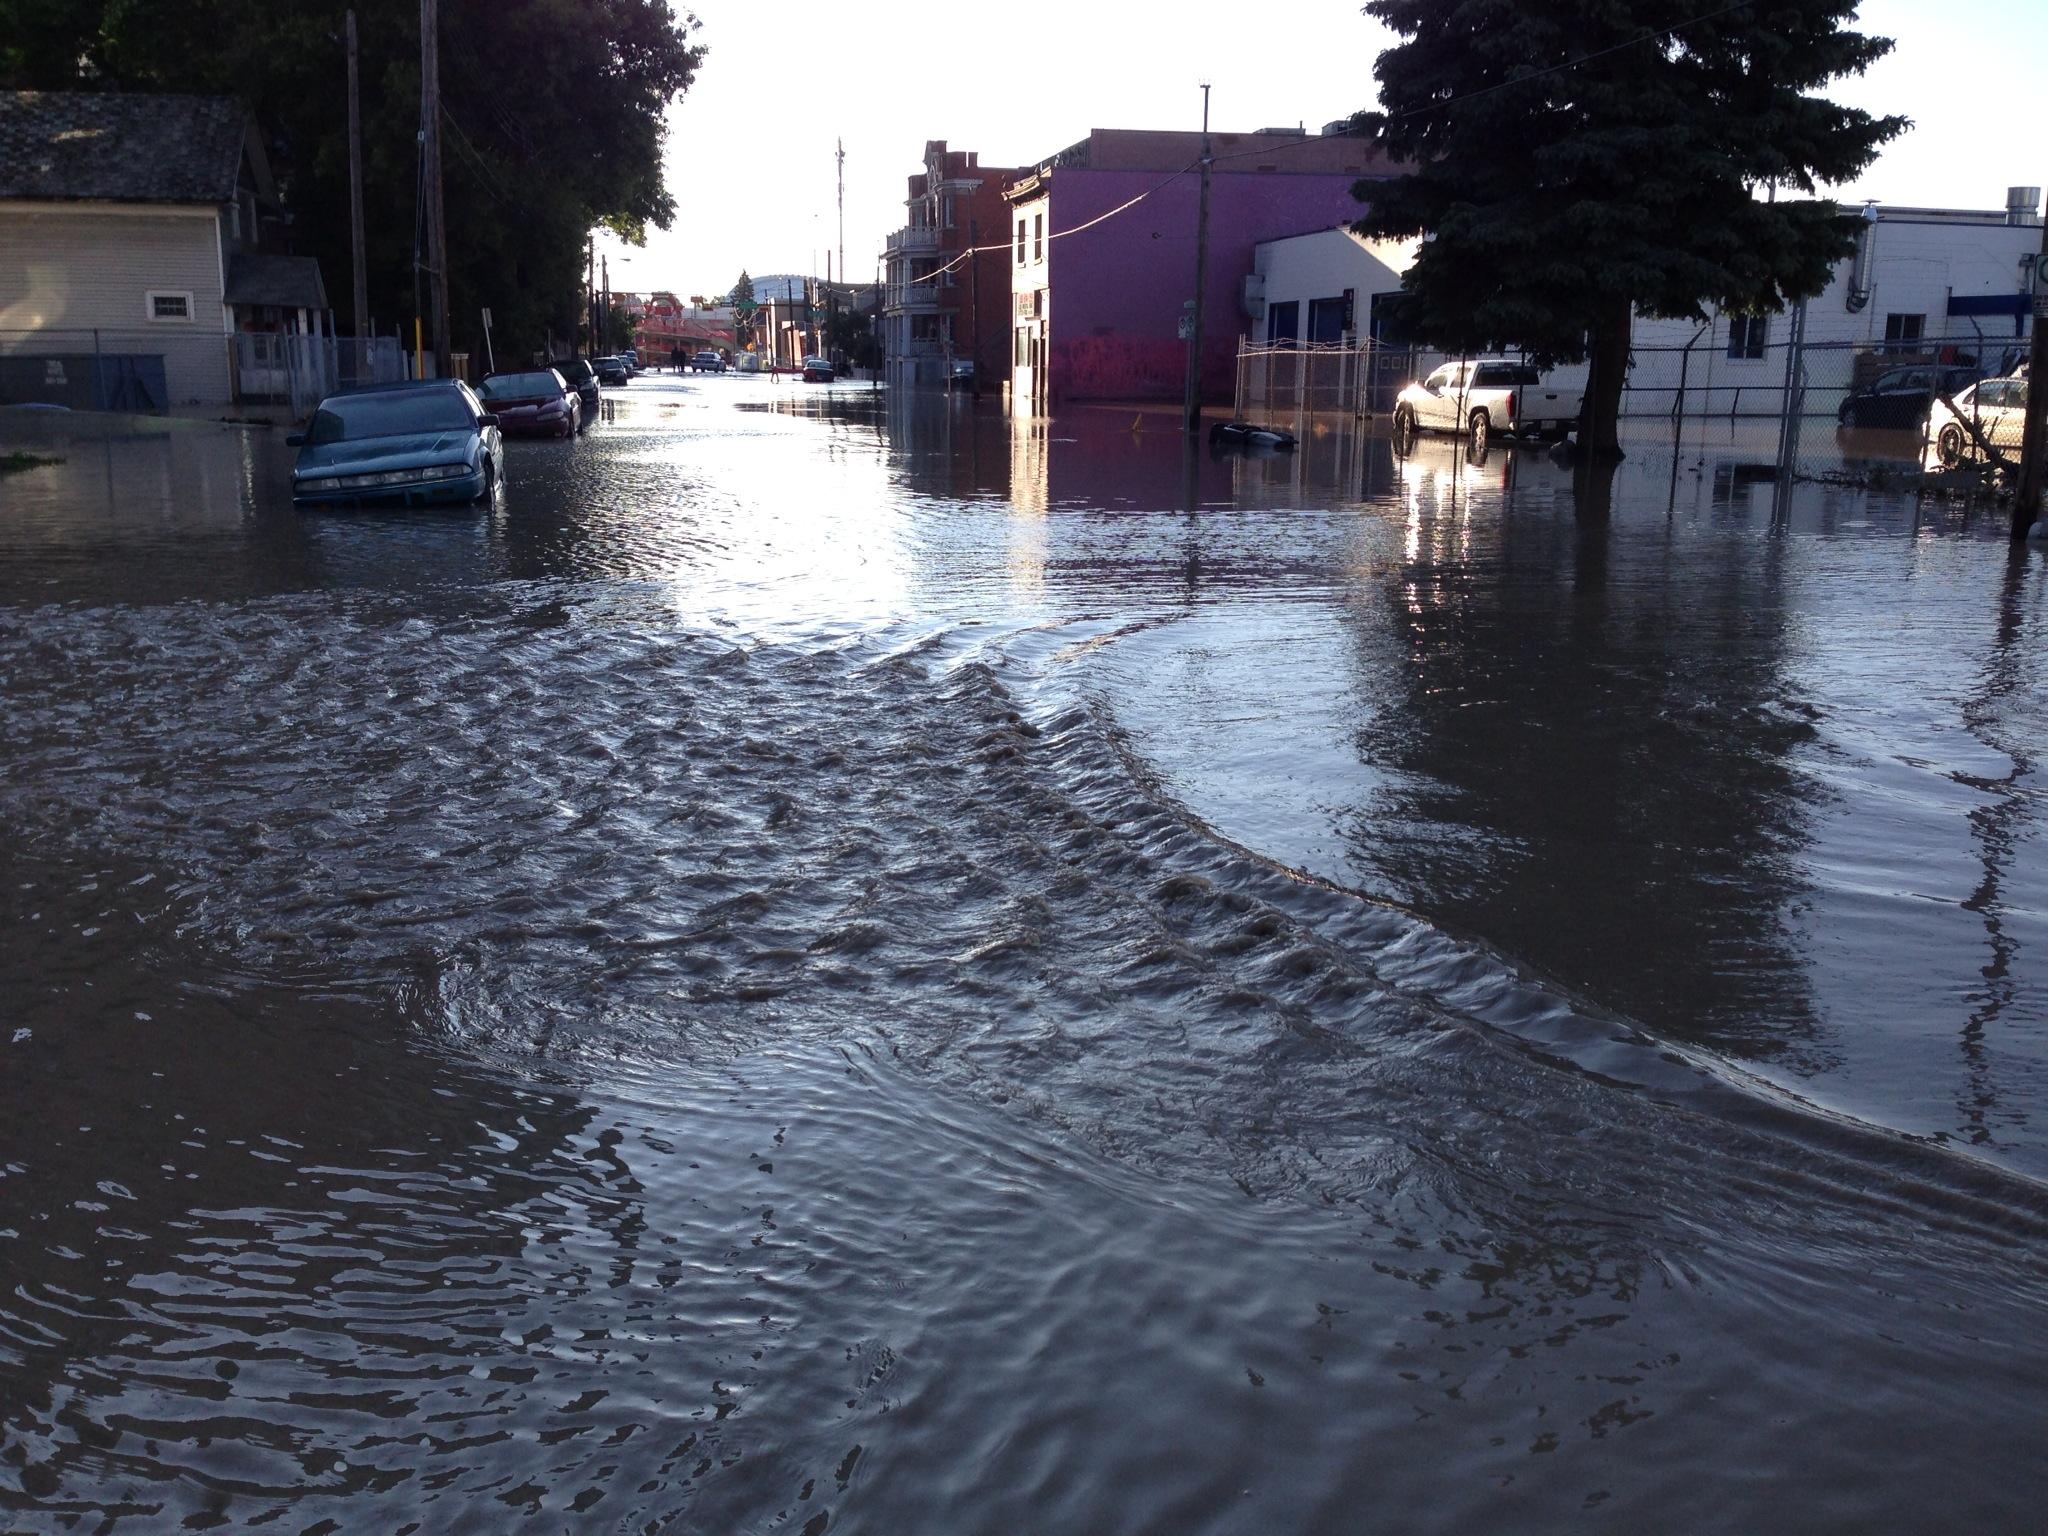 calgary-flood-2013-street-lwwa